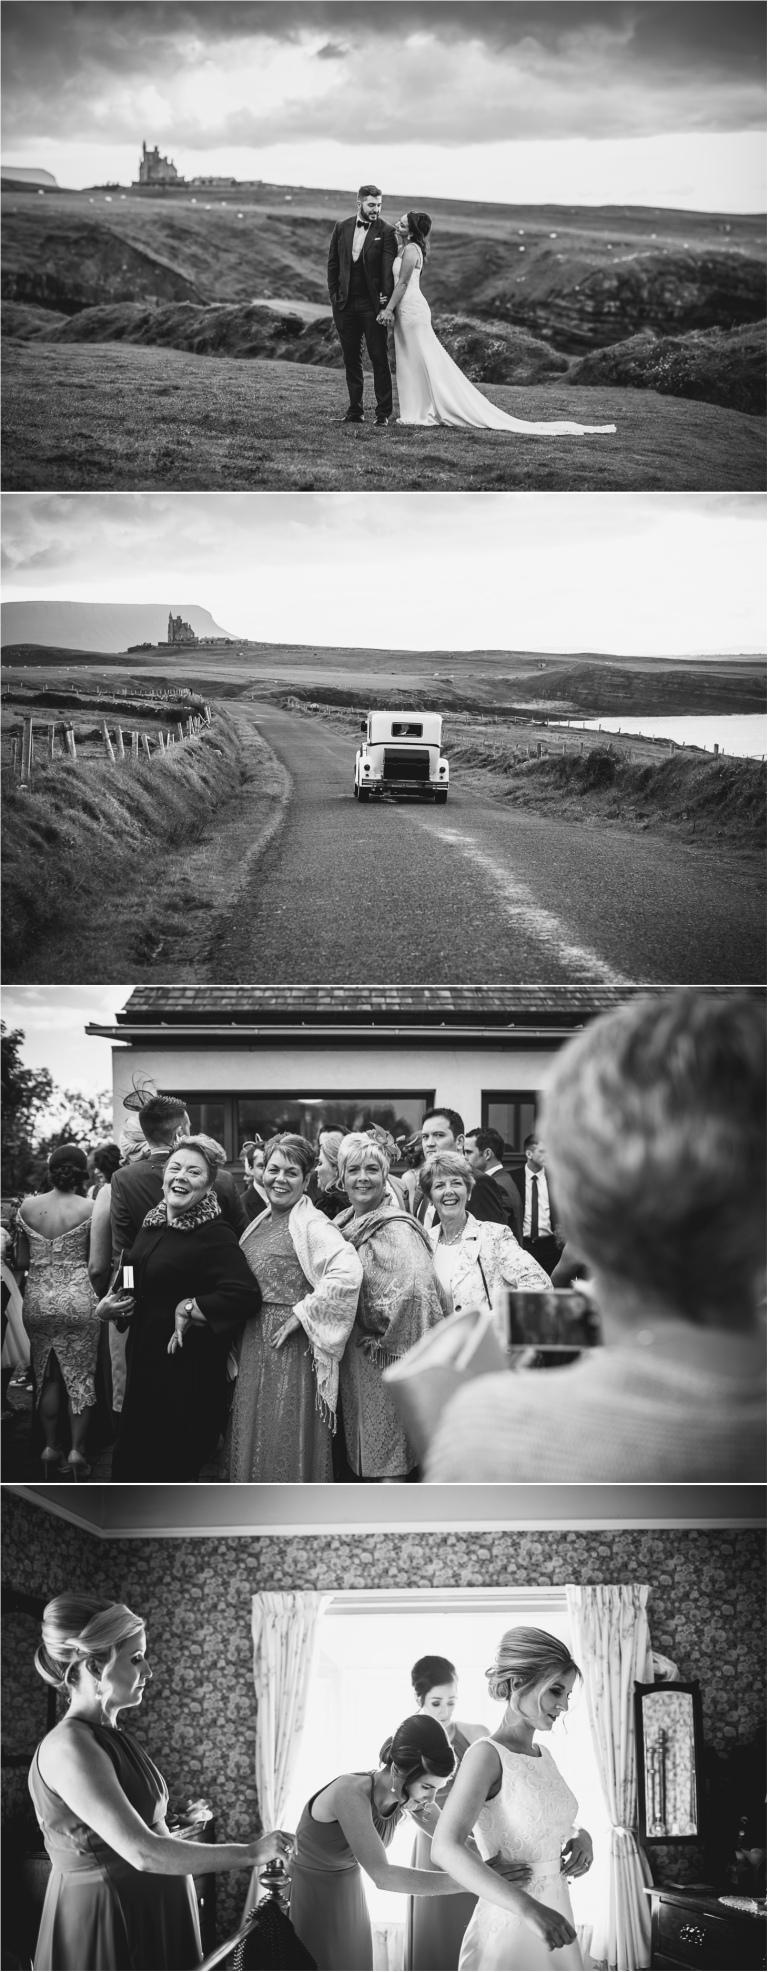 20-darren-fitzpatrick-photography-blog